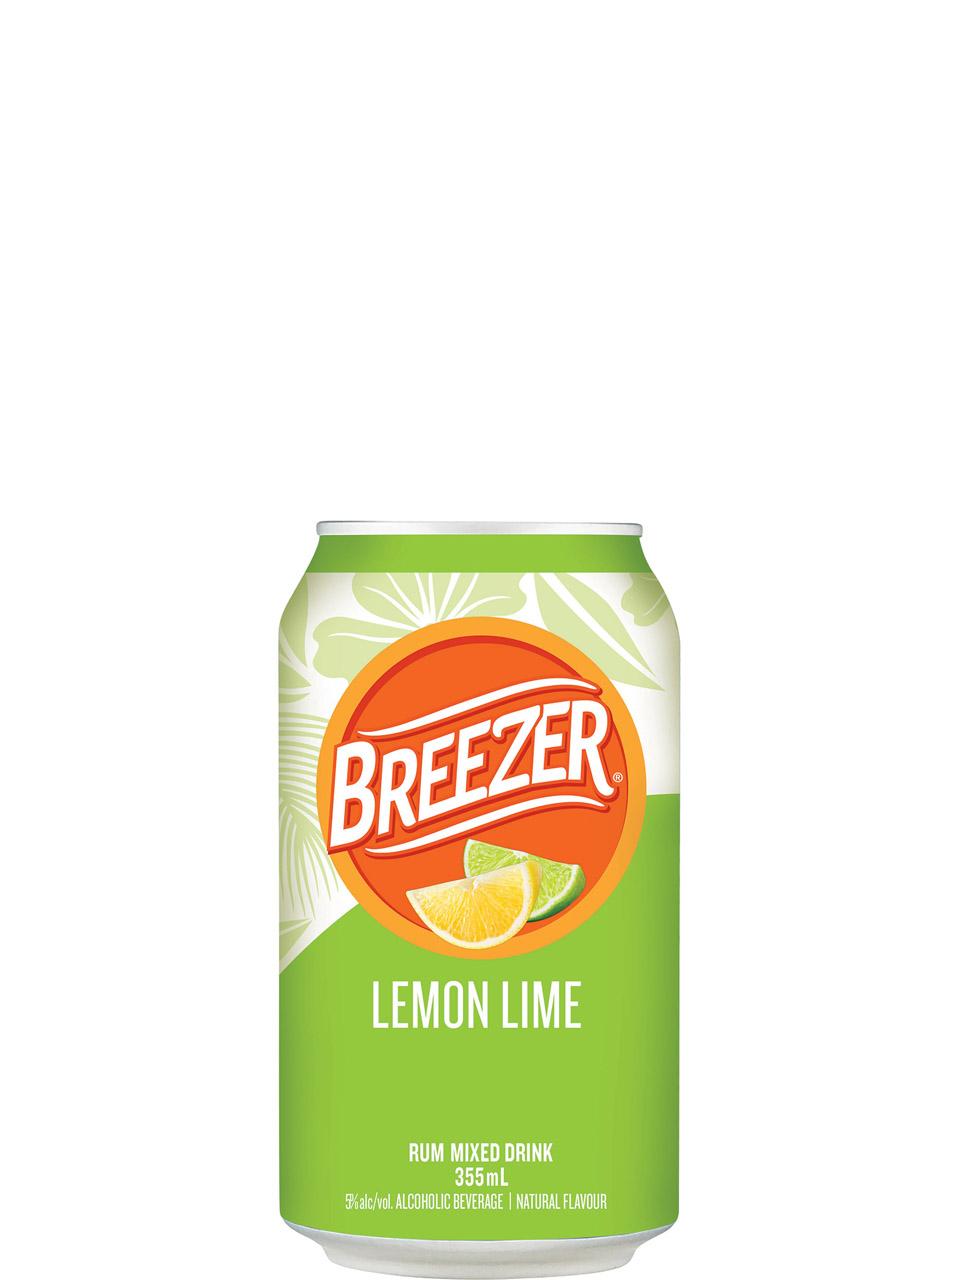 Breezer Lemon Lime 6 Pack Cans